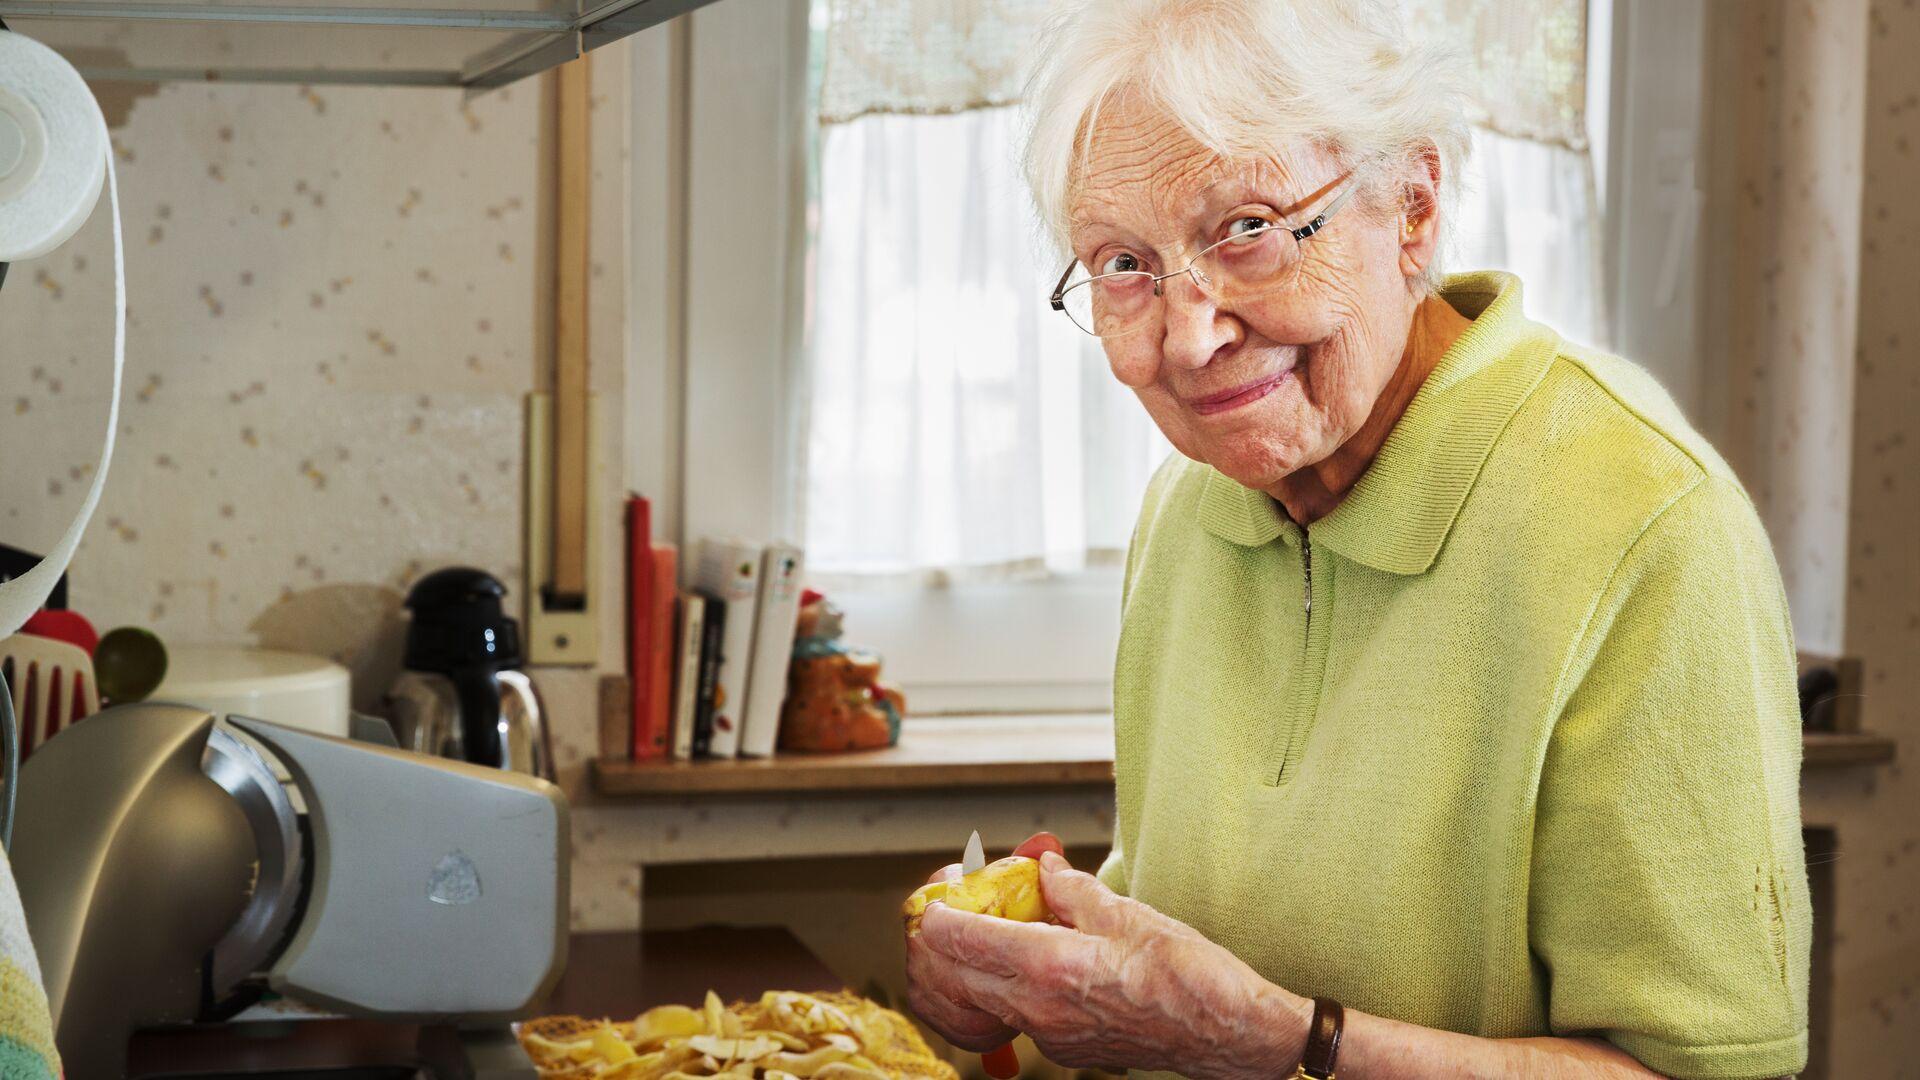 Бабушка готовит на кухне - РИА Новости, 1920, 10.04.2021